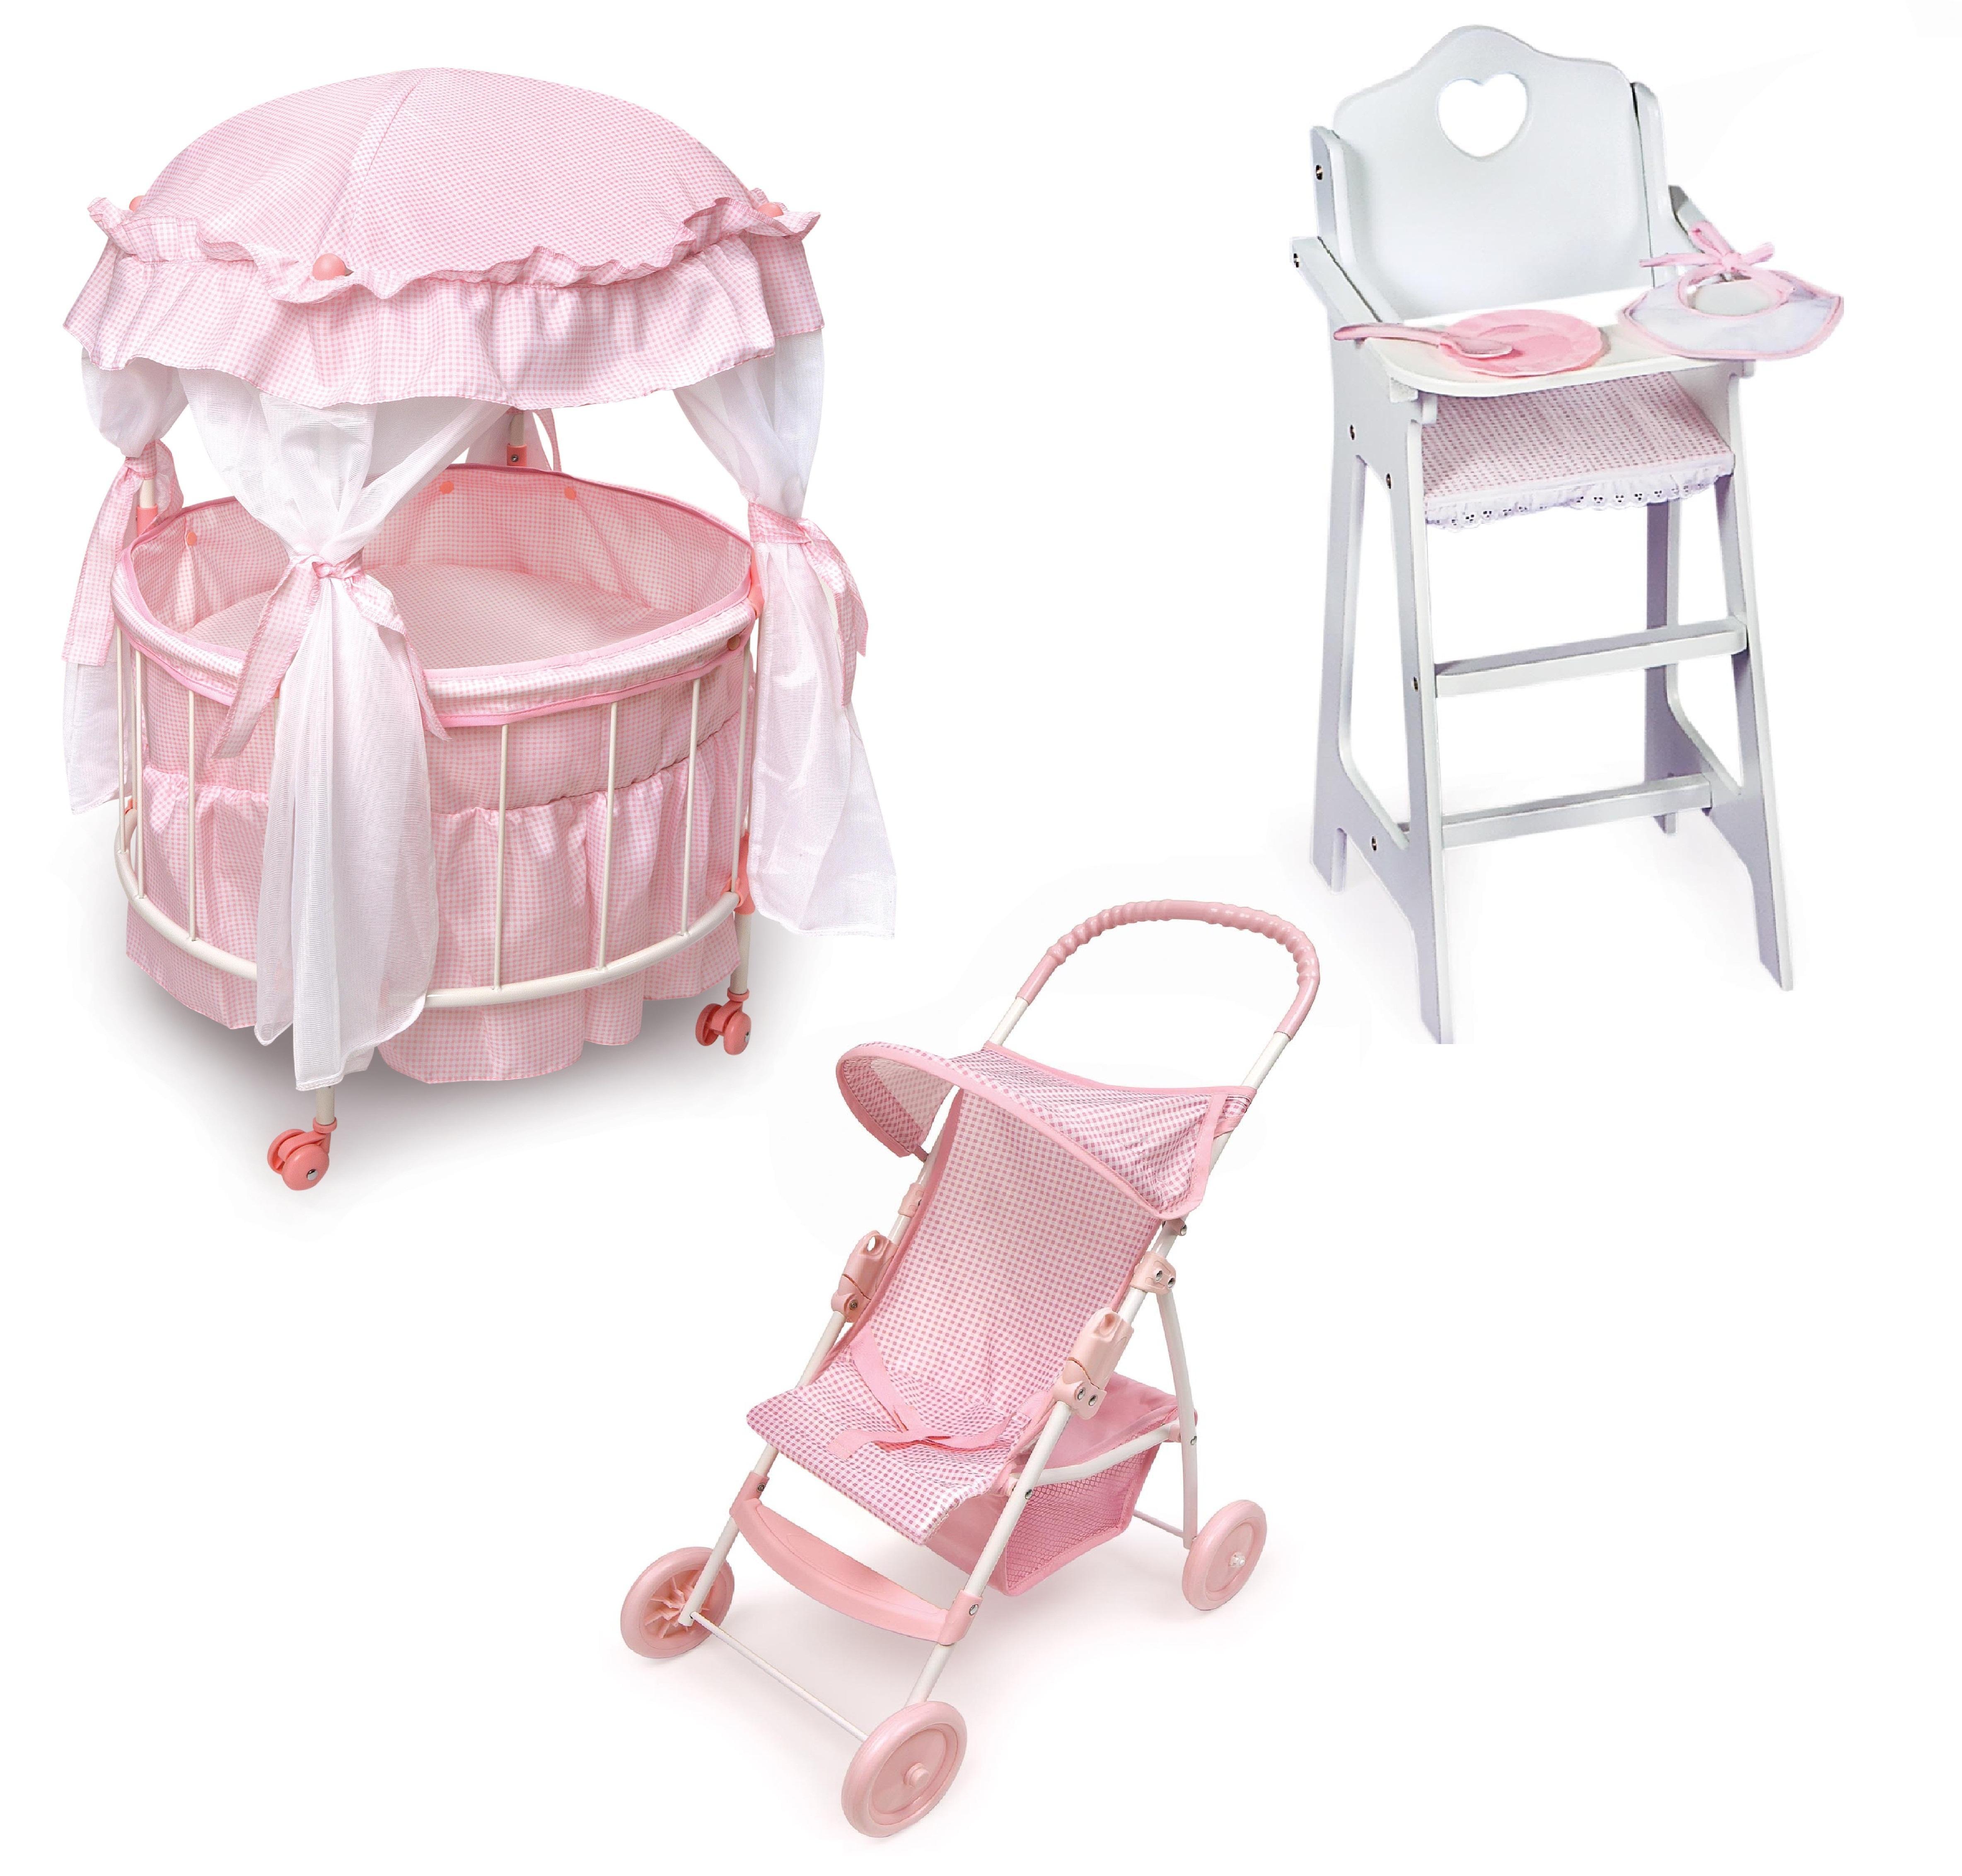 Royal Pavilion Doll Crib Furniture Set Feature High Chair Com